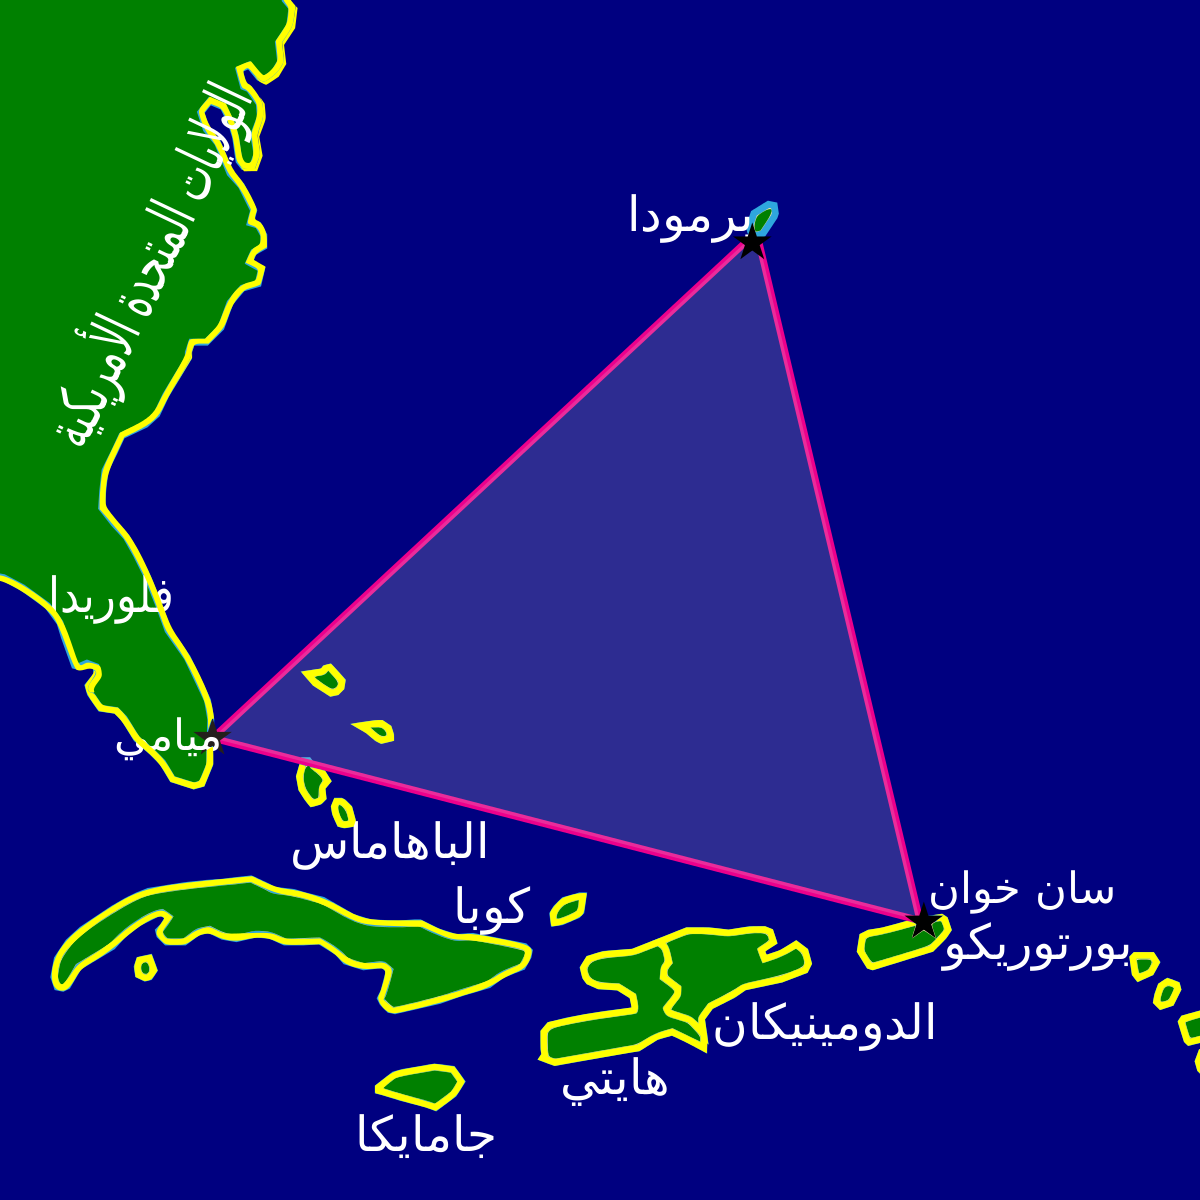 بالصور حقيقة مثلث برمودا , الحقيقة حول لغز مثلث برمودا 1570